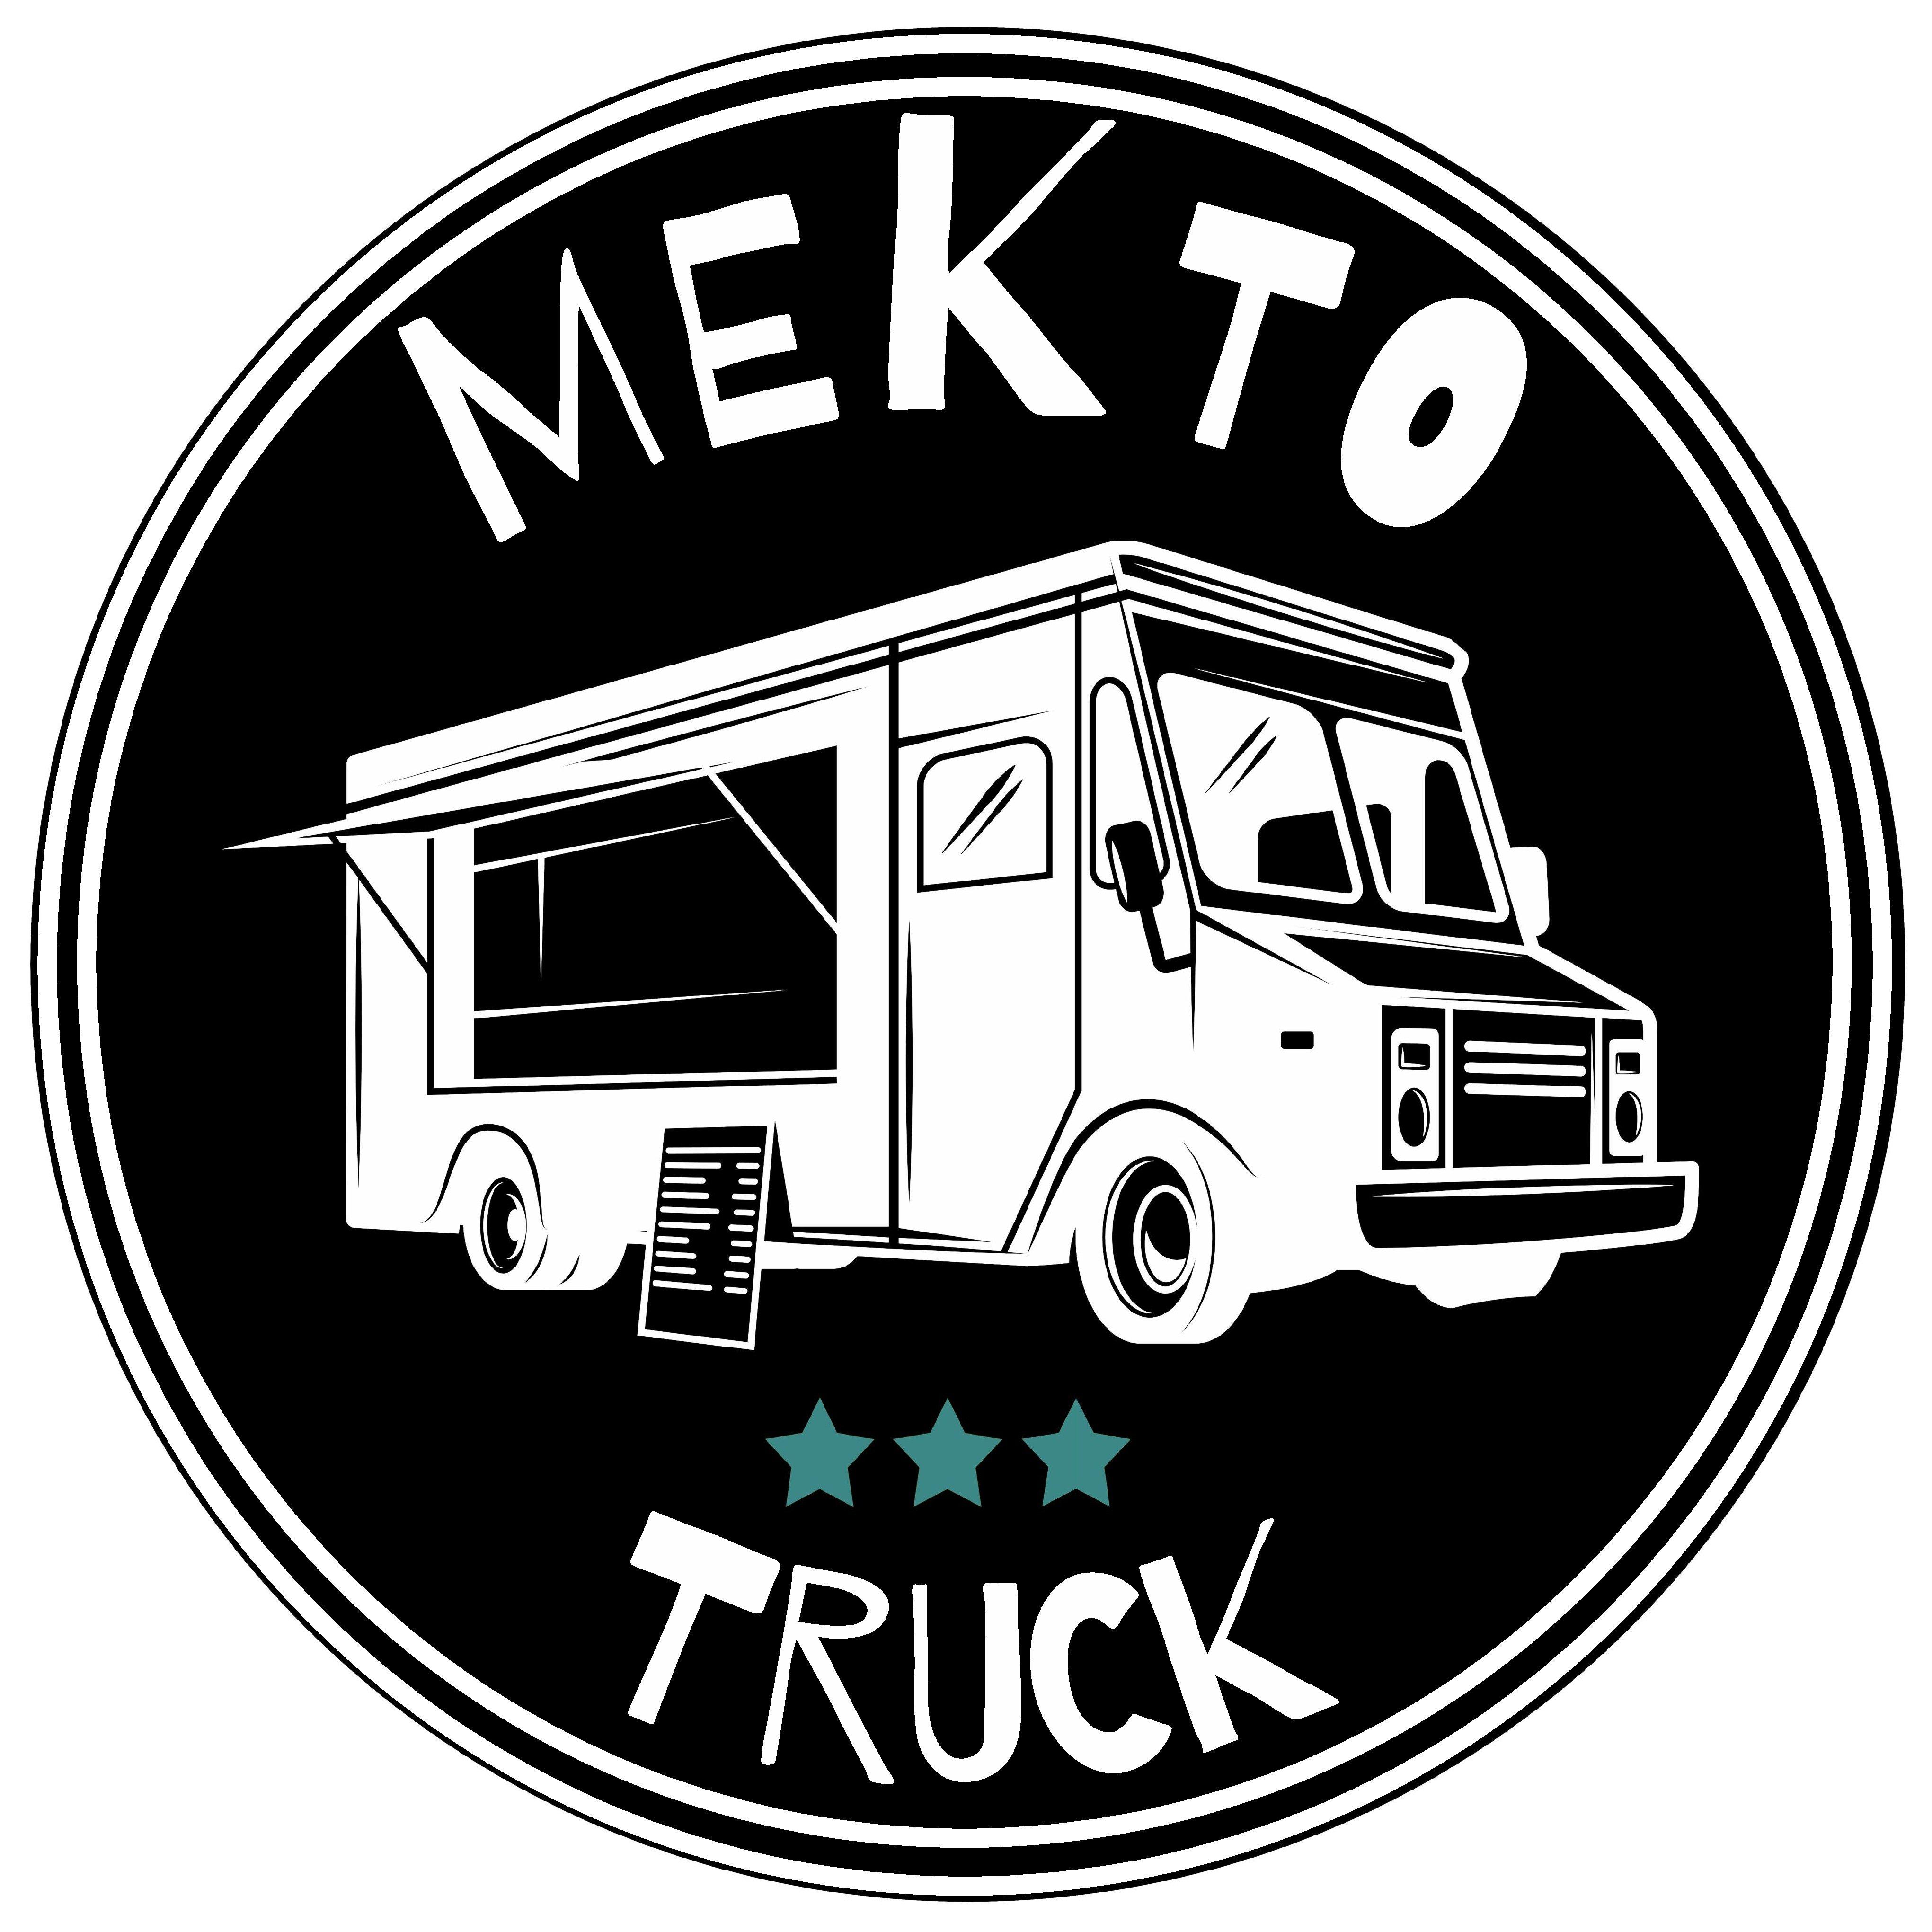 MeKto Truck